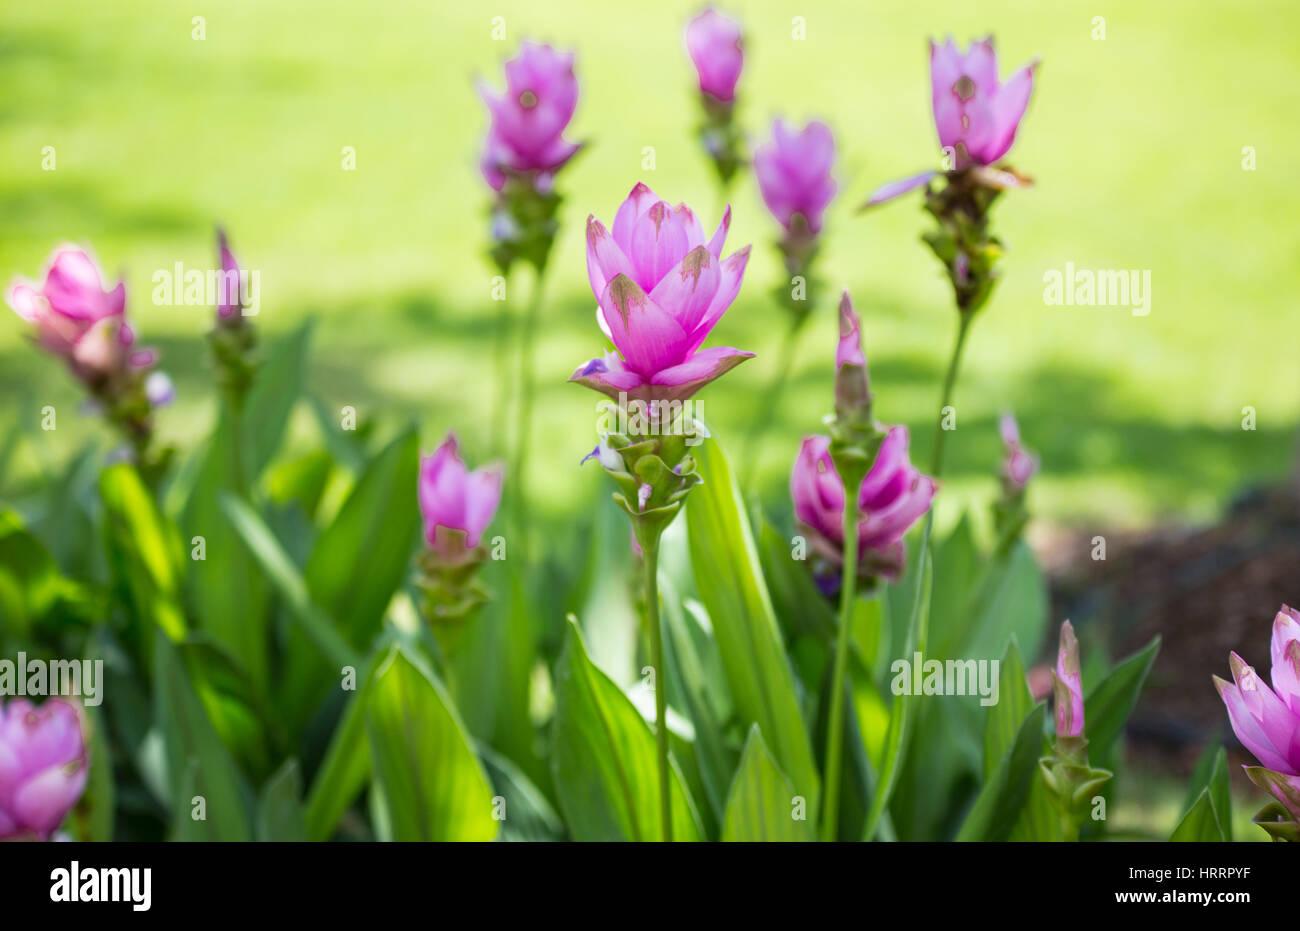 Wallpaper Background Garden Park Outdoor Fog Down Flower Curcuma Sessilisthailand Tropical Forests